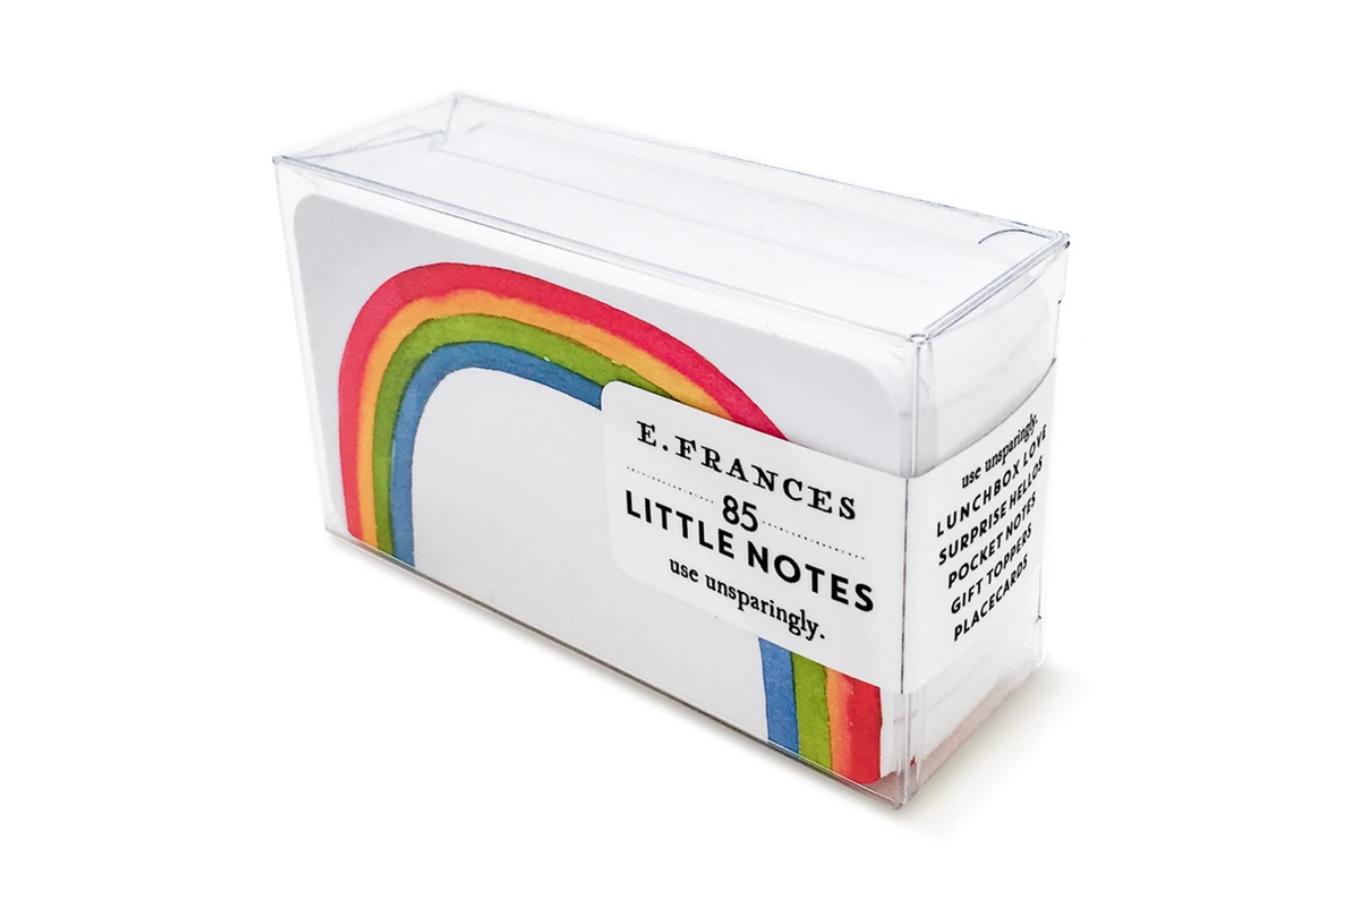 Raindbow little notes